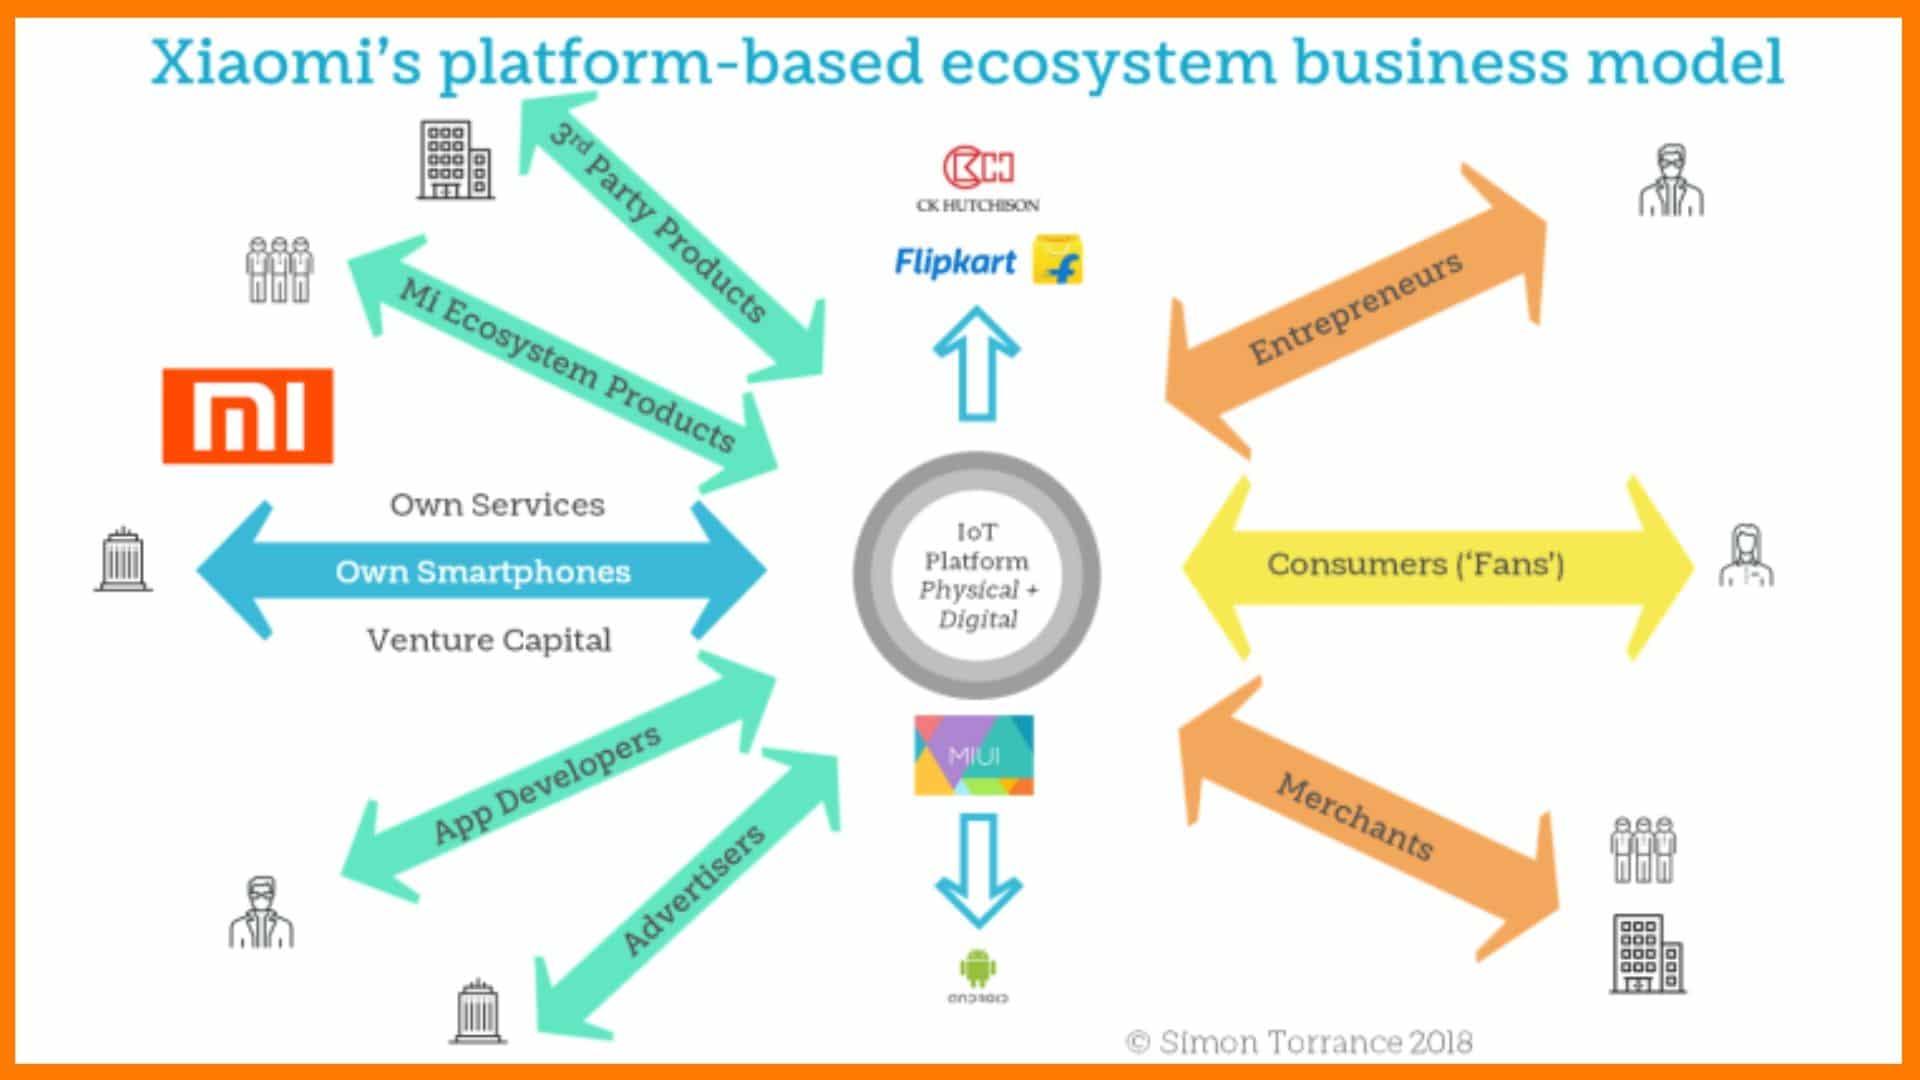 Xiaomi's Business Model